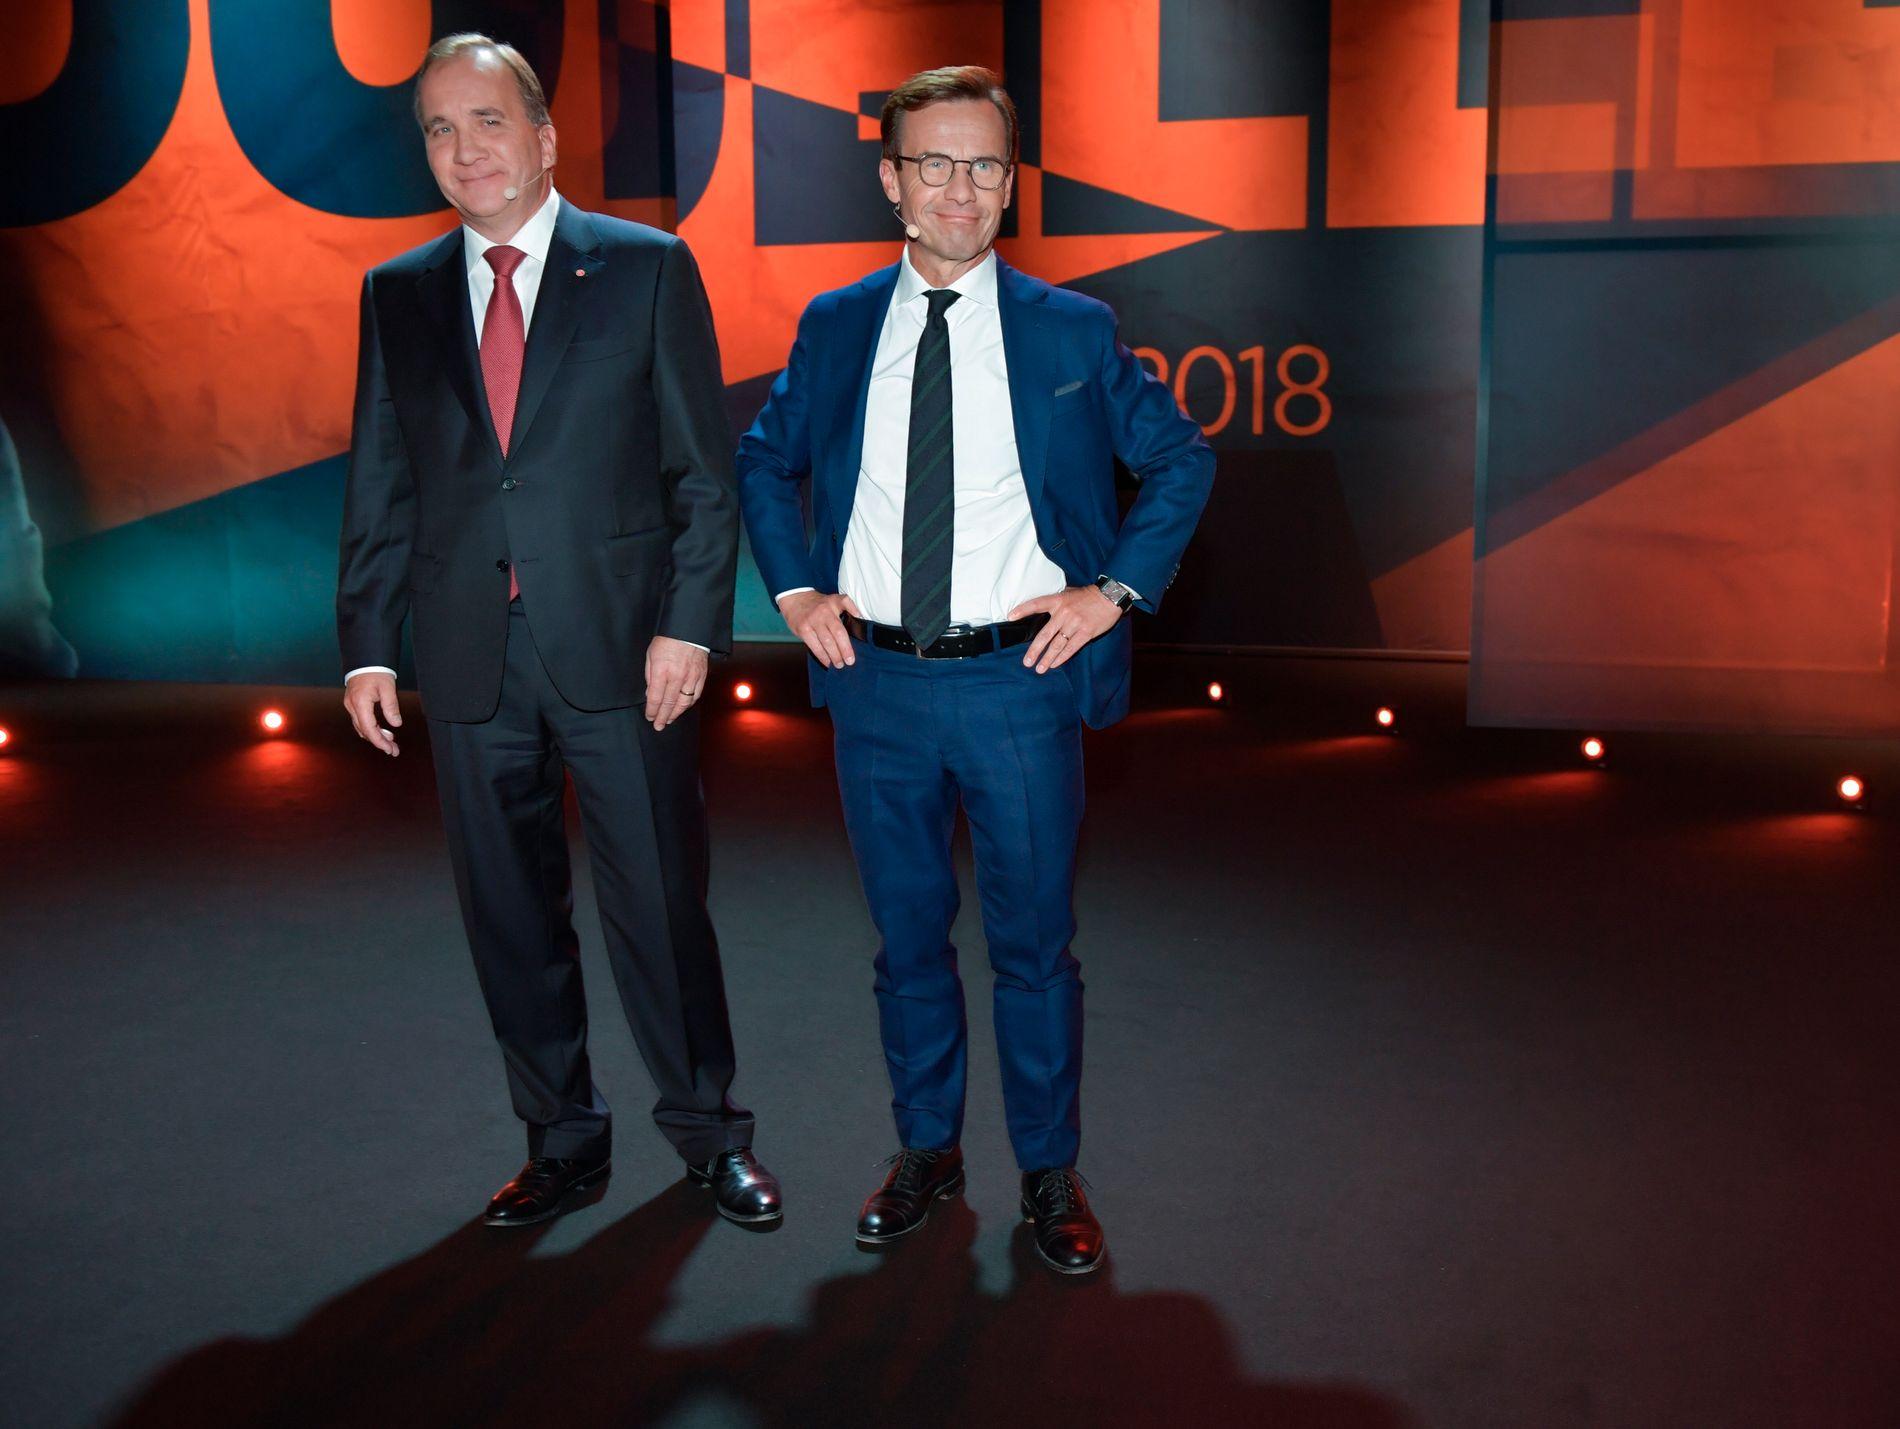 INVITERER: Moderaternas partileder Ulf Kristersson (til høyre) vil i dialog med Socialdemokraternas partileder Stefan Löfven om regjeringsspørsmålet.